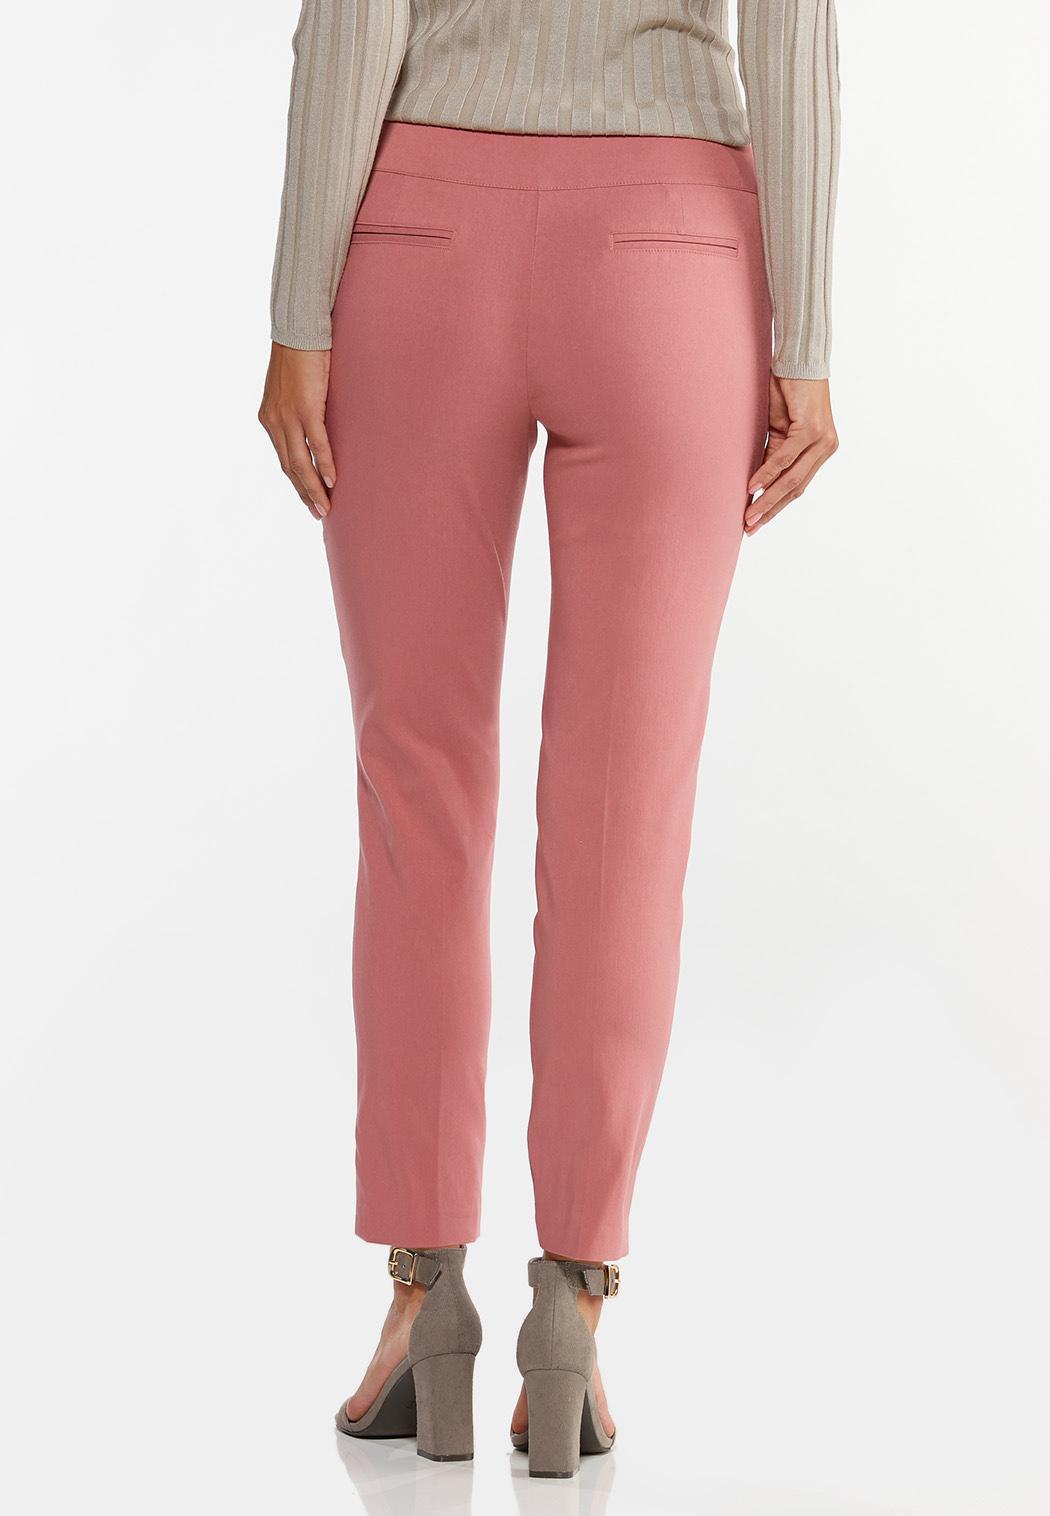 Dusty Rose Bengaline Pants (Item #44426106)